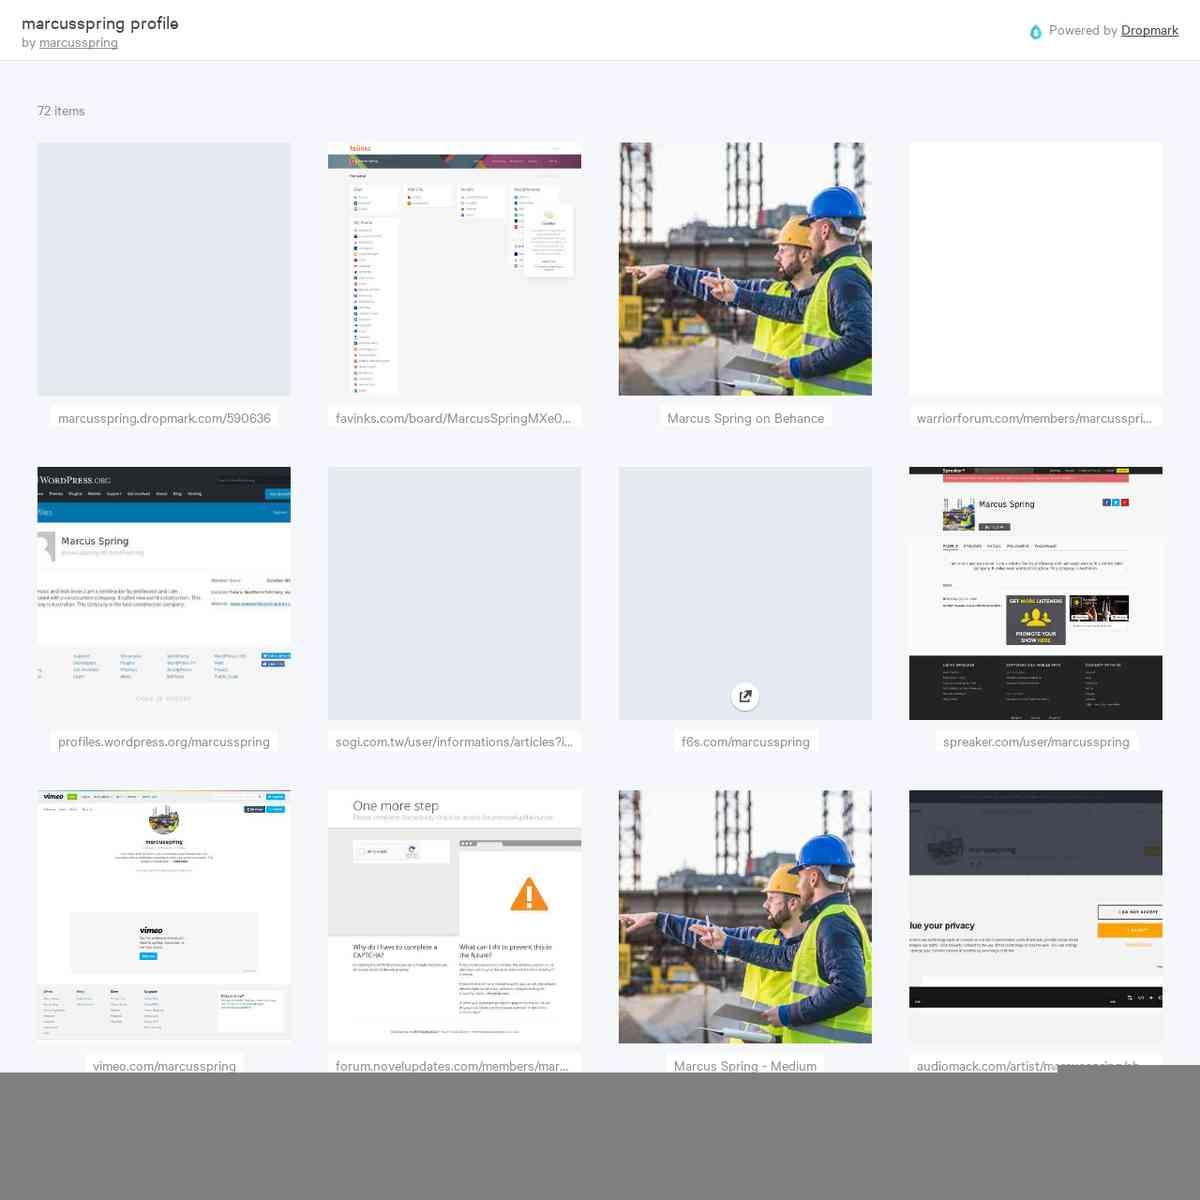 marcusspring.dropmark.com/590636